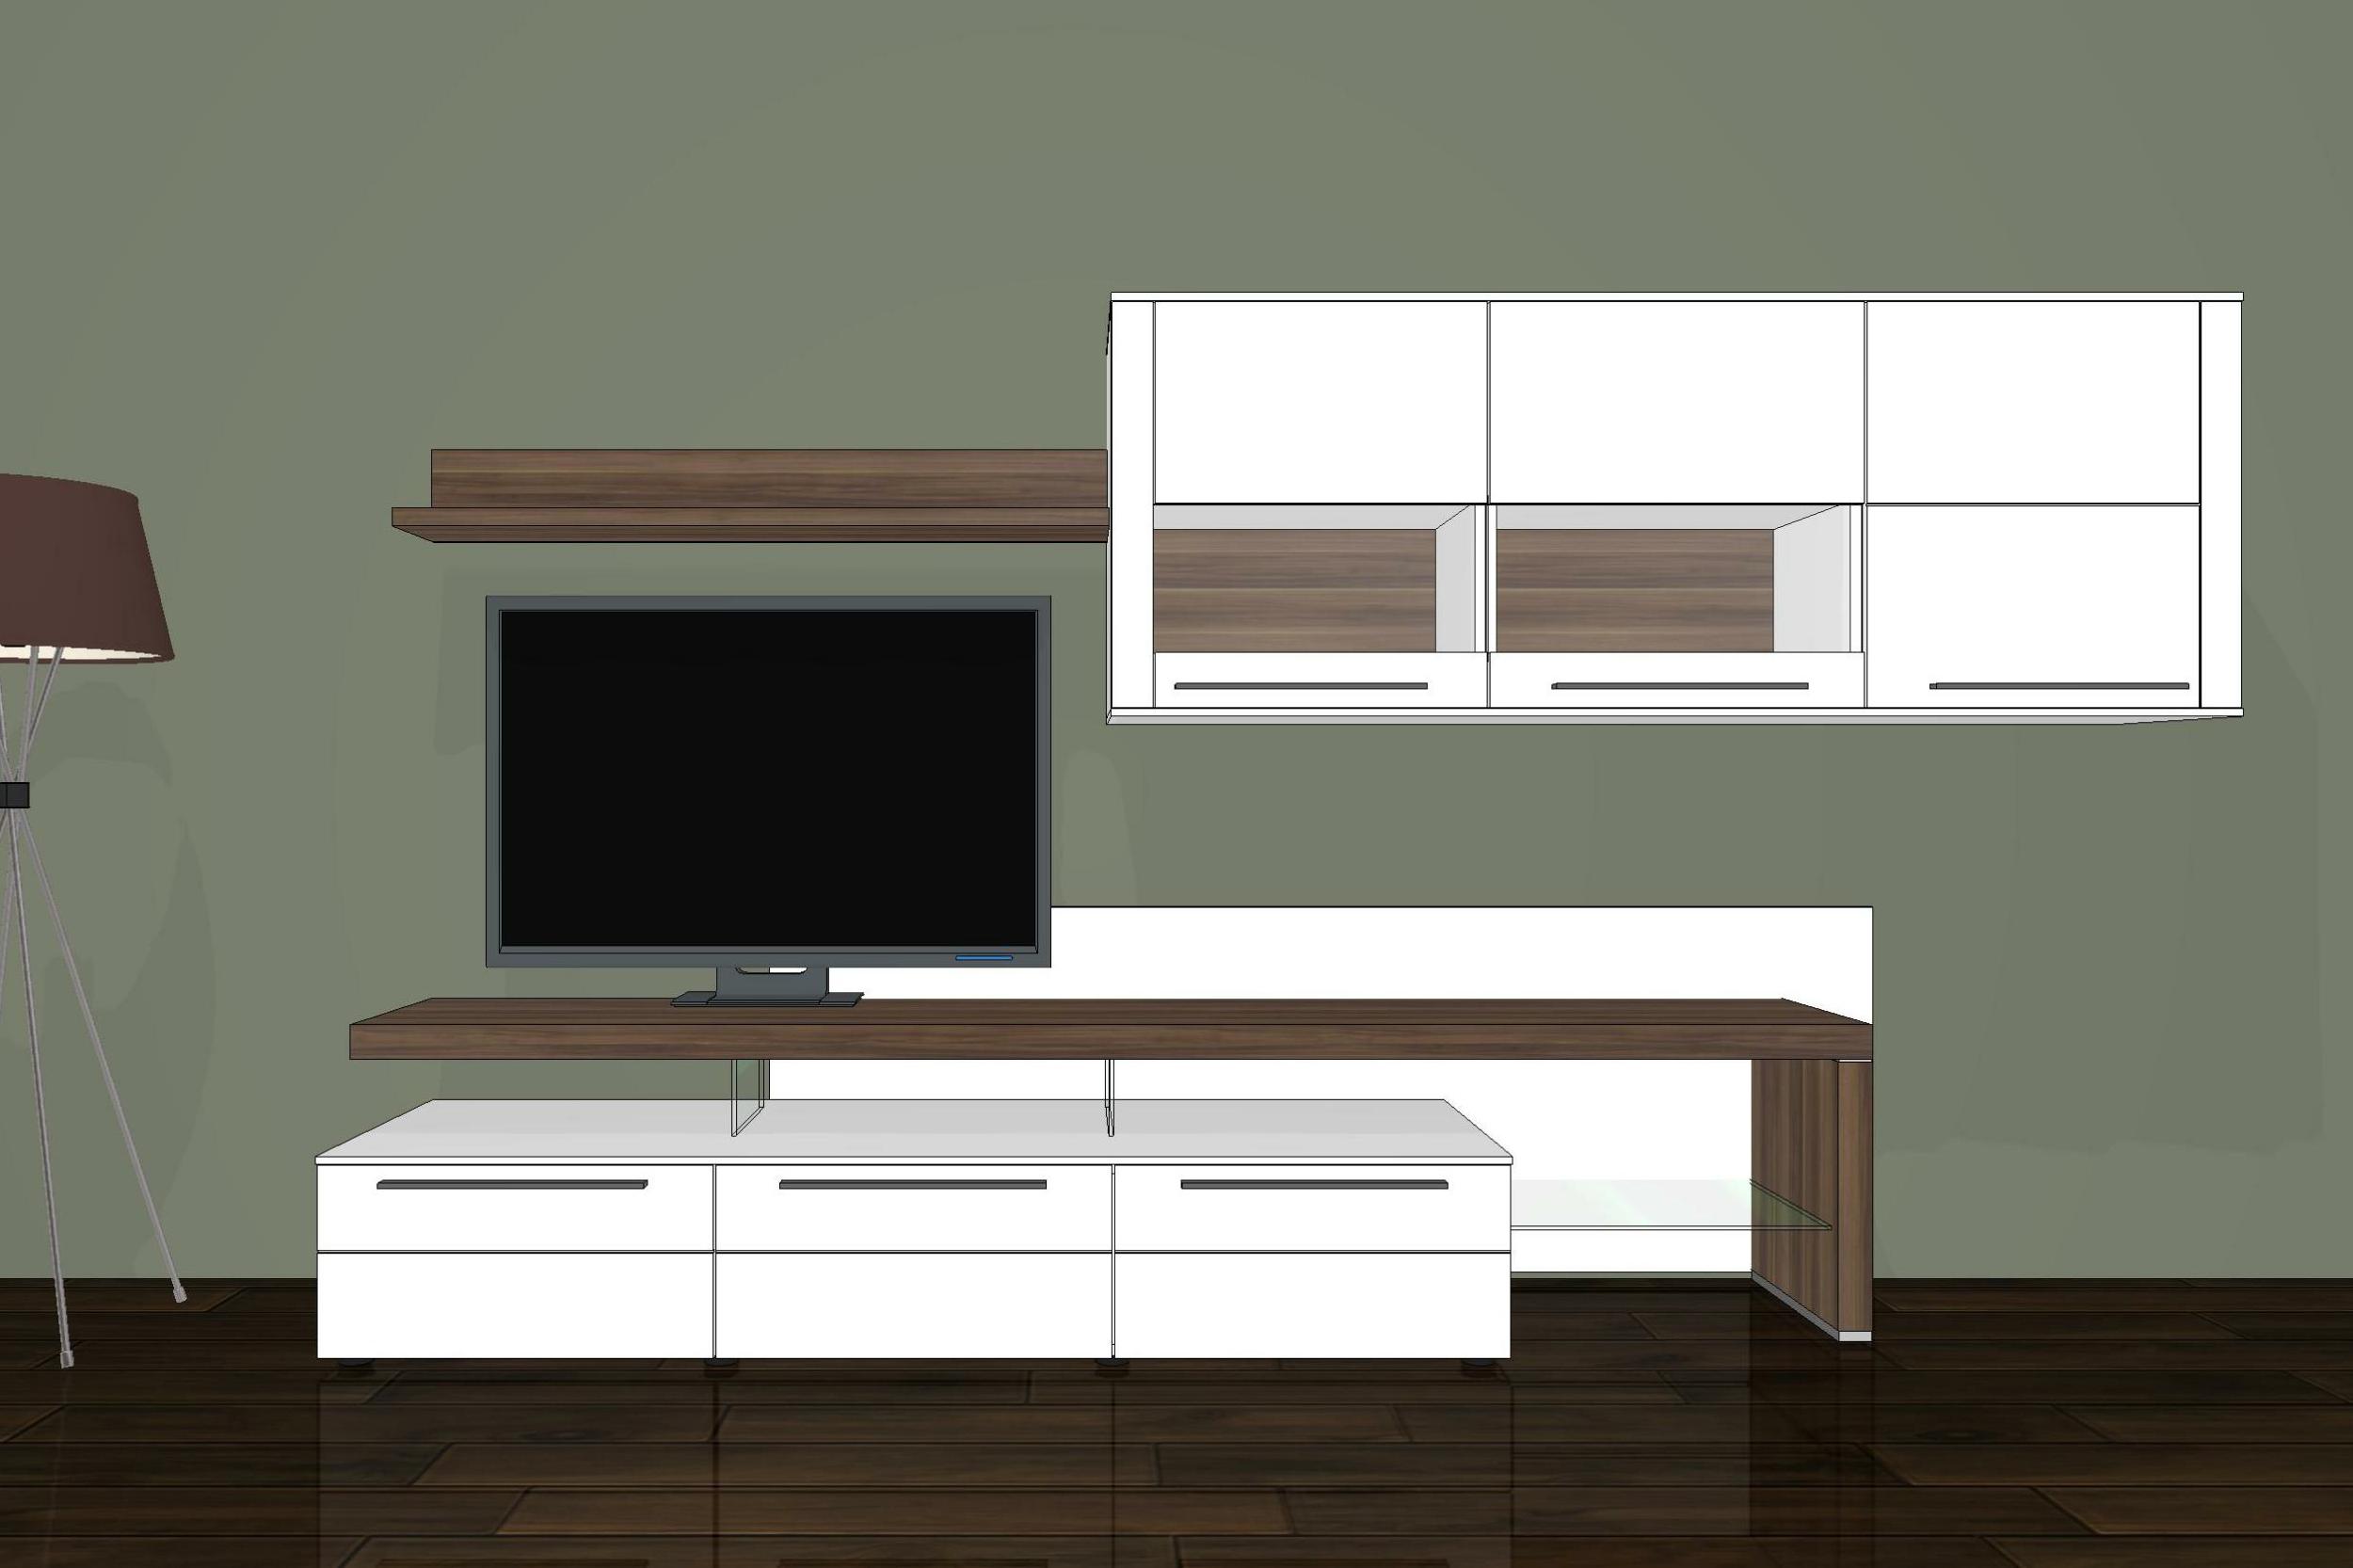 HD Wallpapers Wohnzimmer Planen Online Kostenlos Hdidwallpapersccf - Wohnzimmer planen online kostenlos